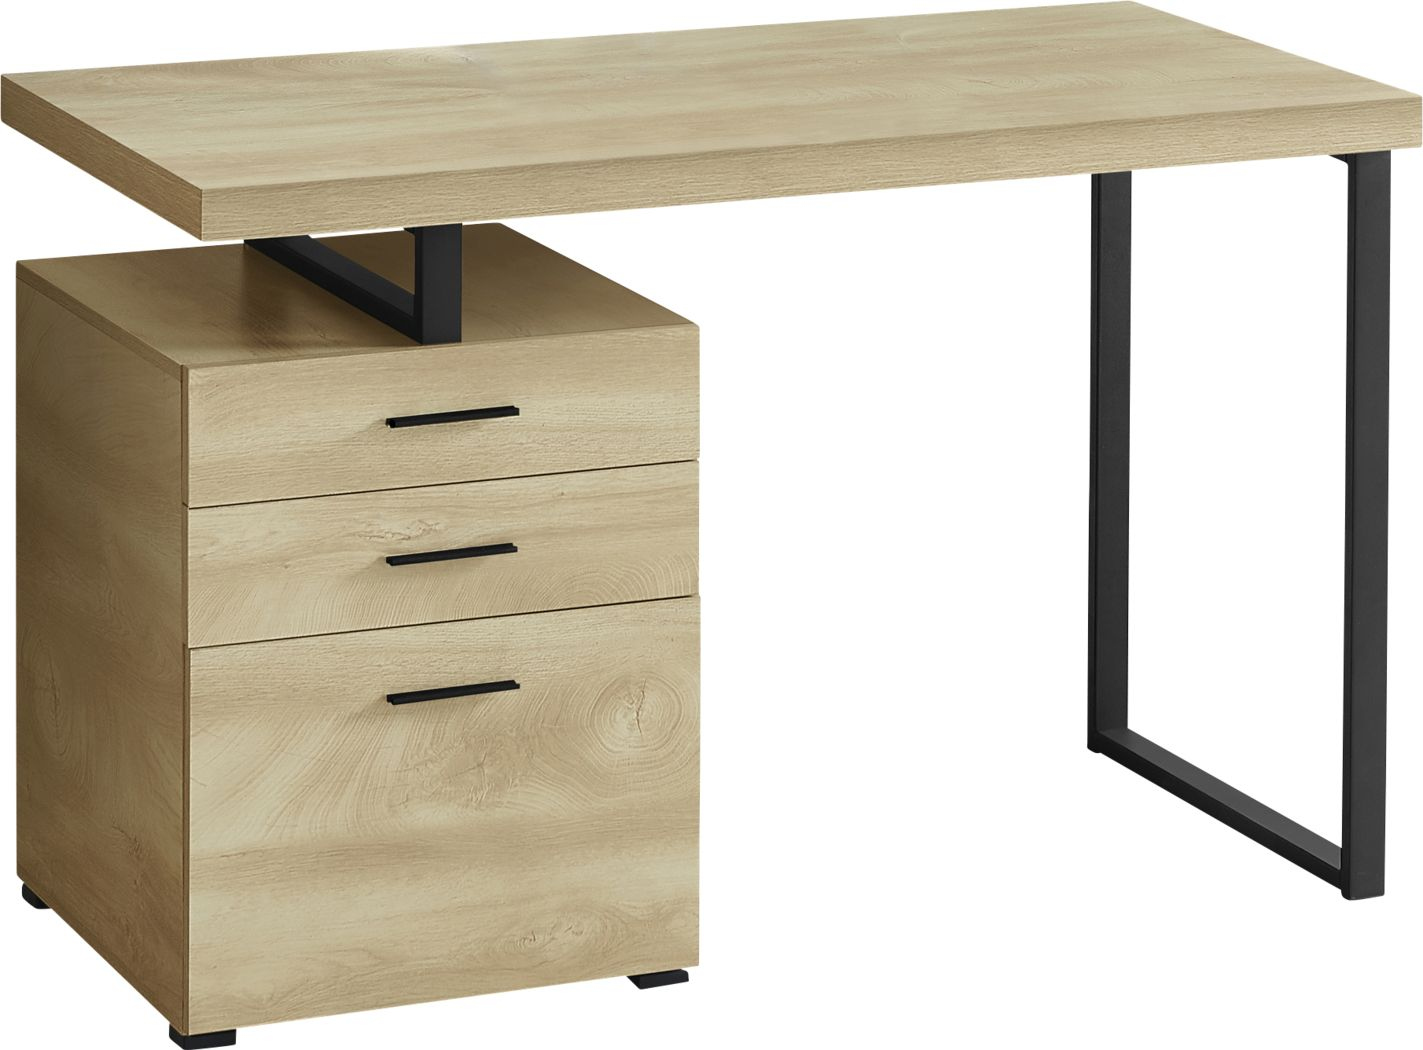 Calavetti Natural Desk